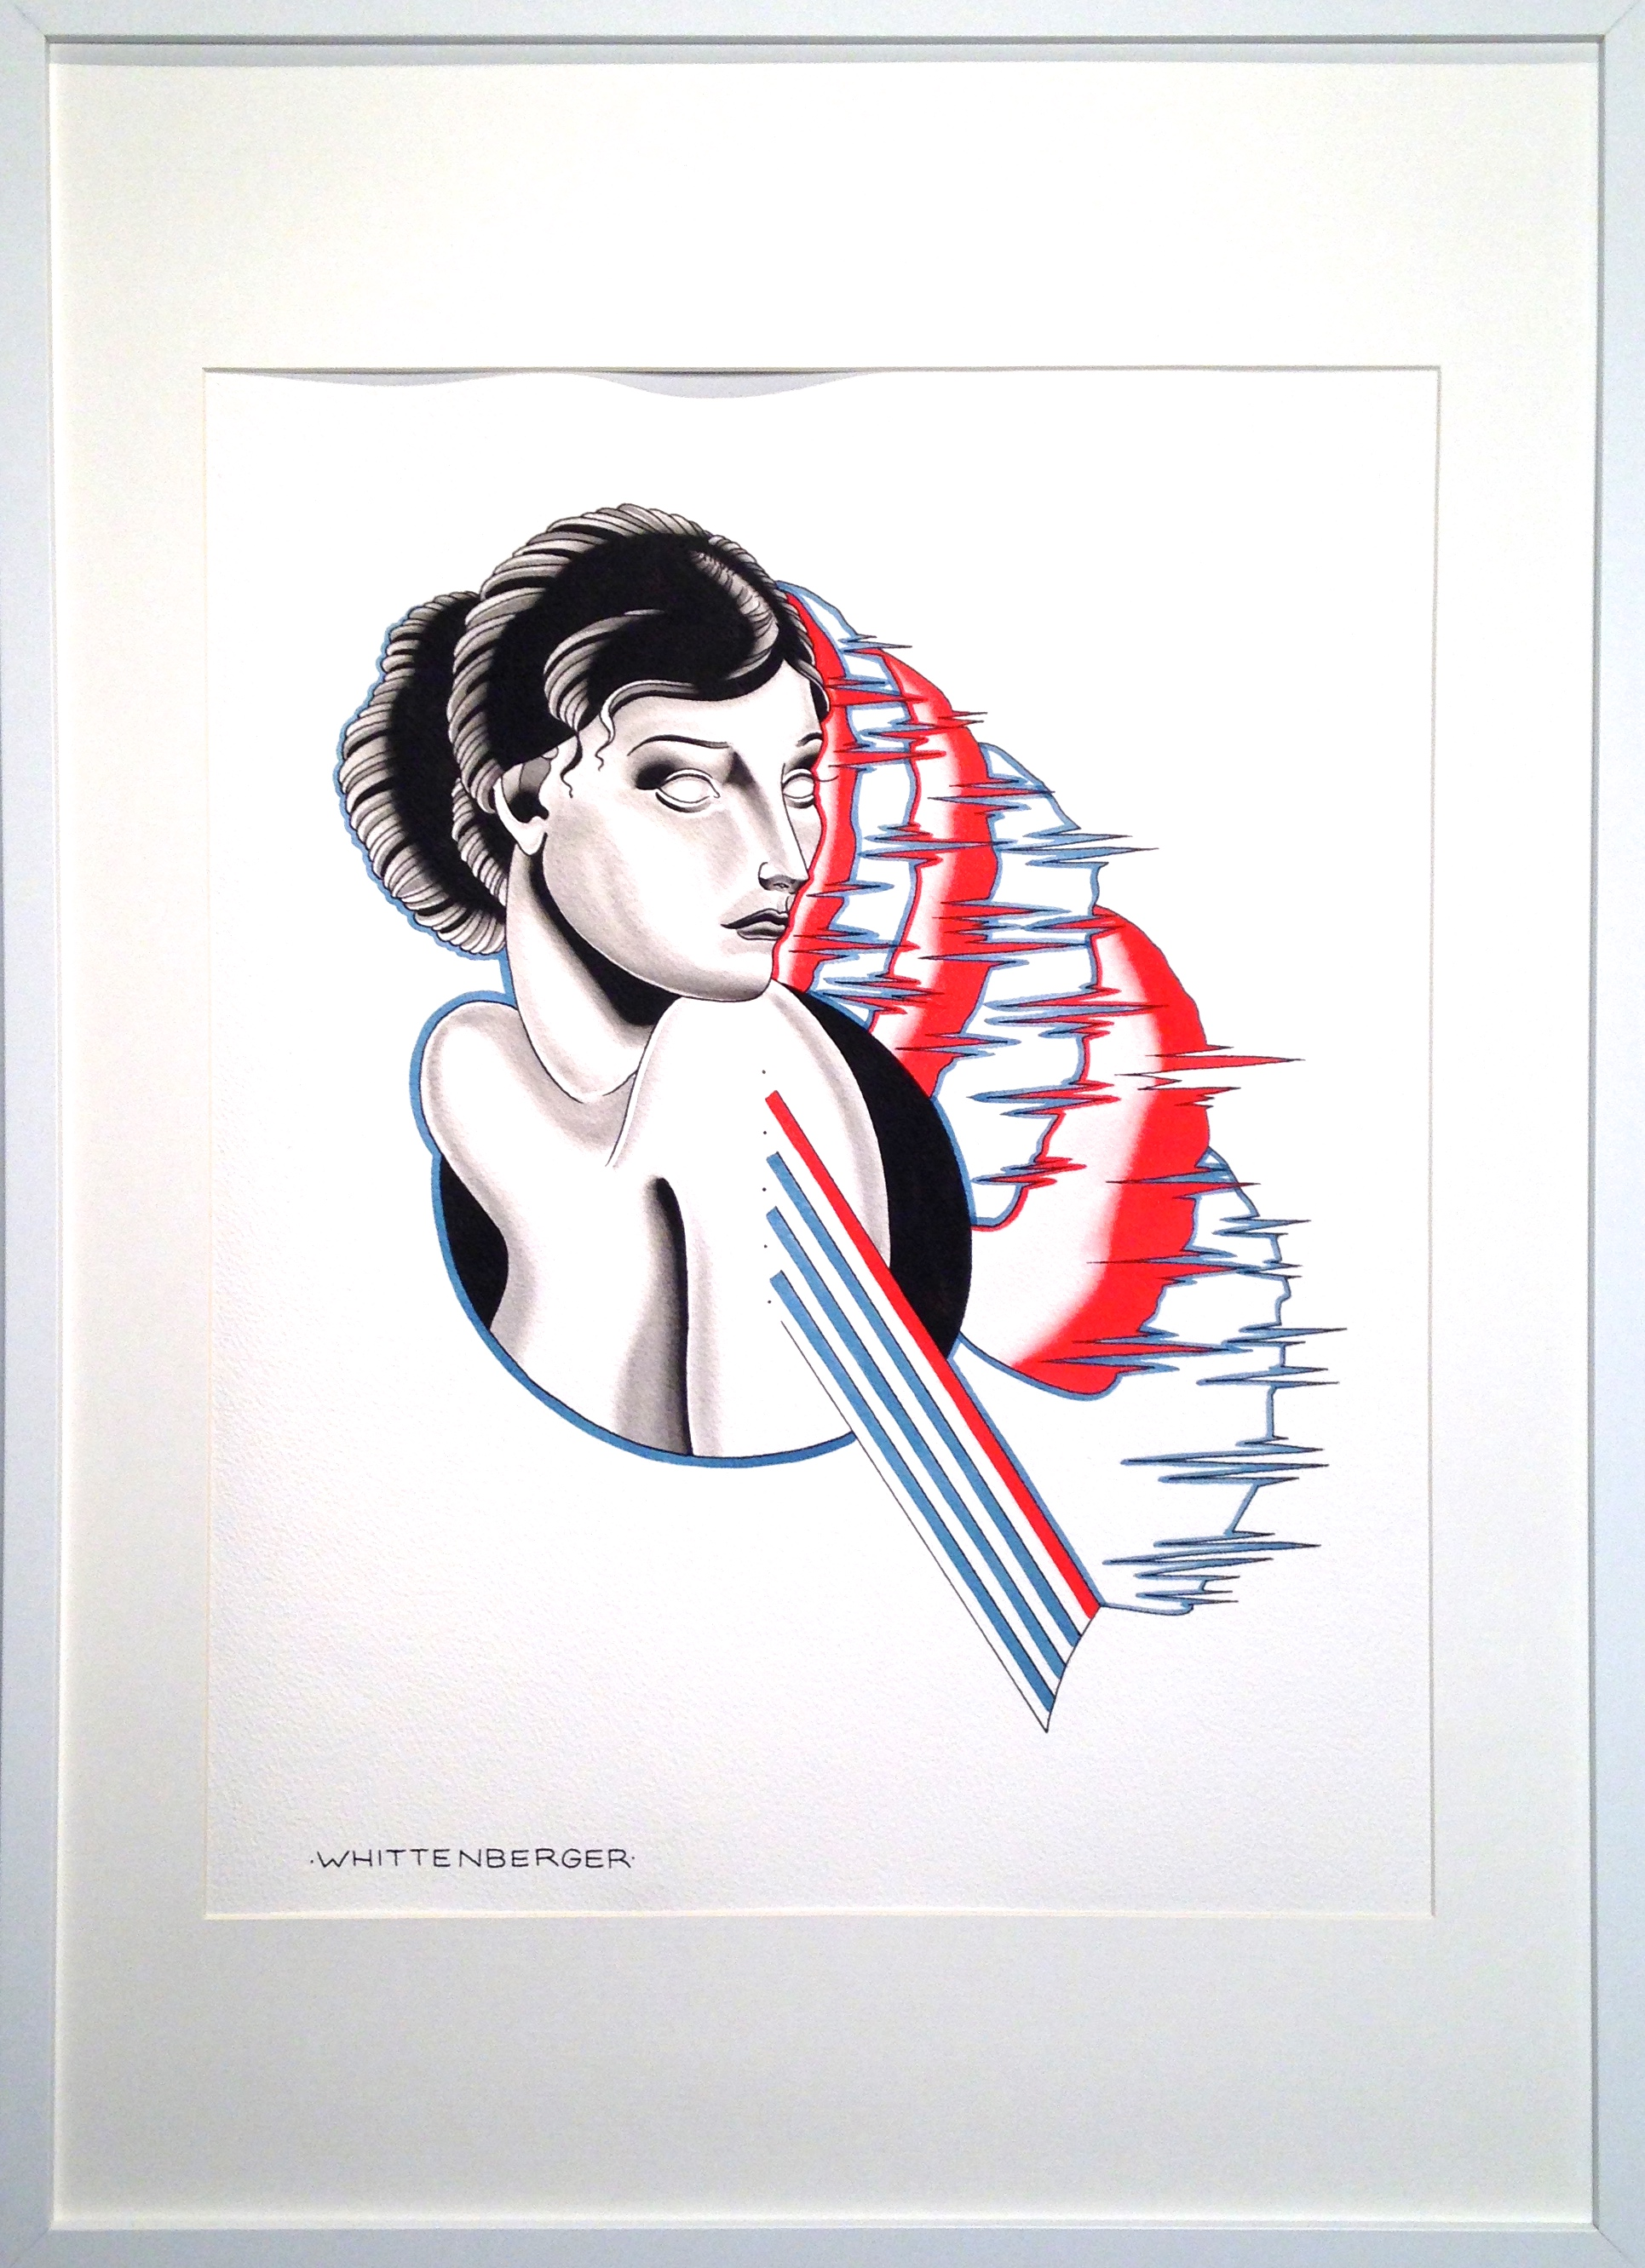 OPHELIA 19 in. x 27 in. framed  $400